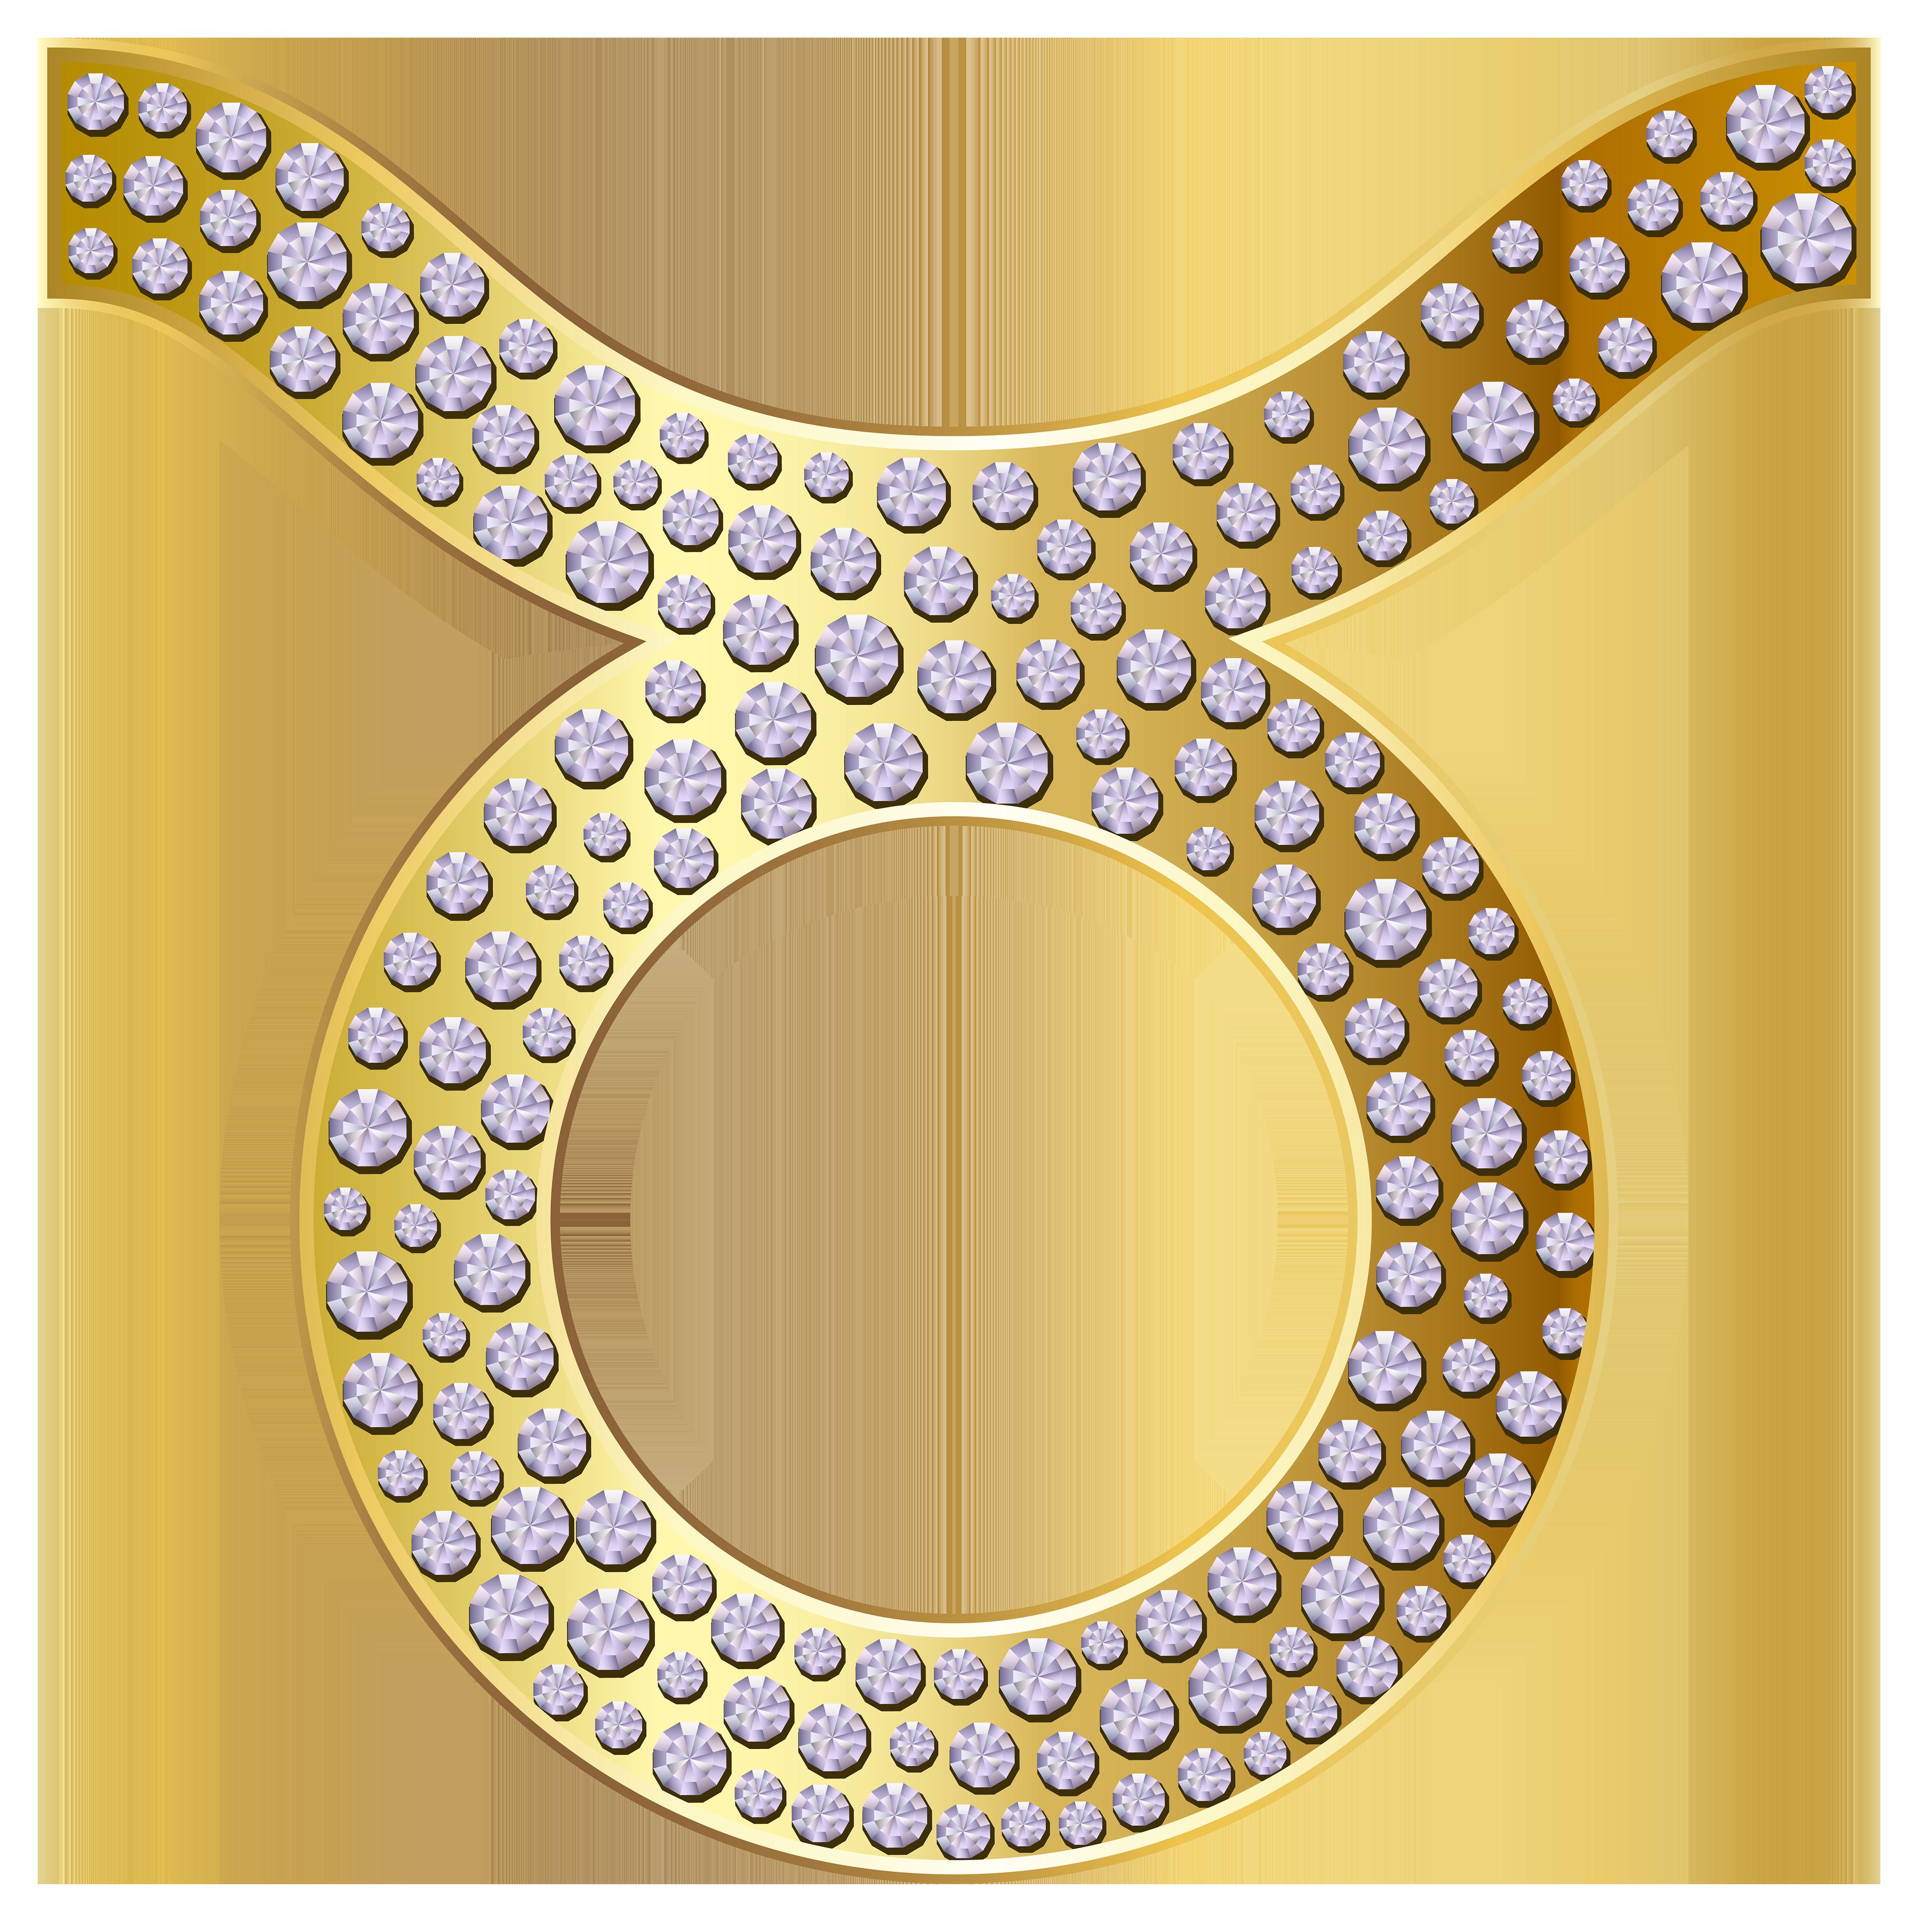 Zodiac clipart taurus Zodiac Art Gold PNG ·